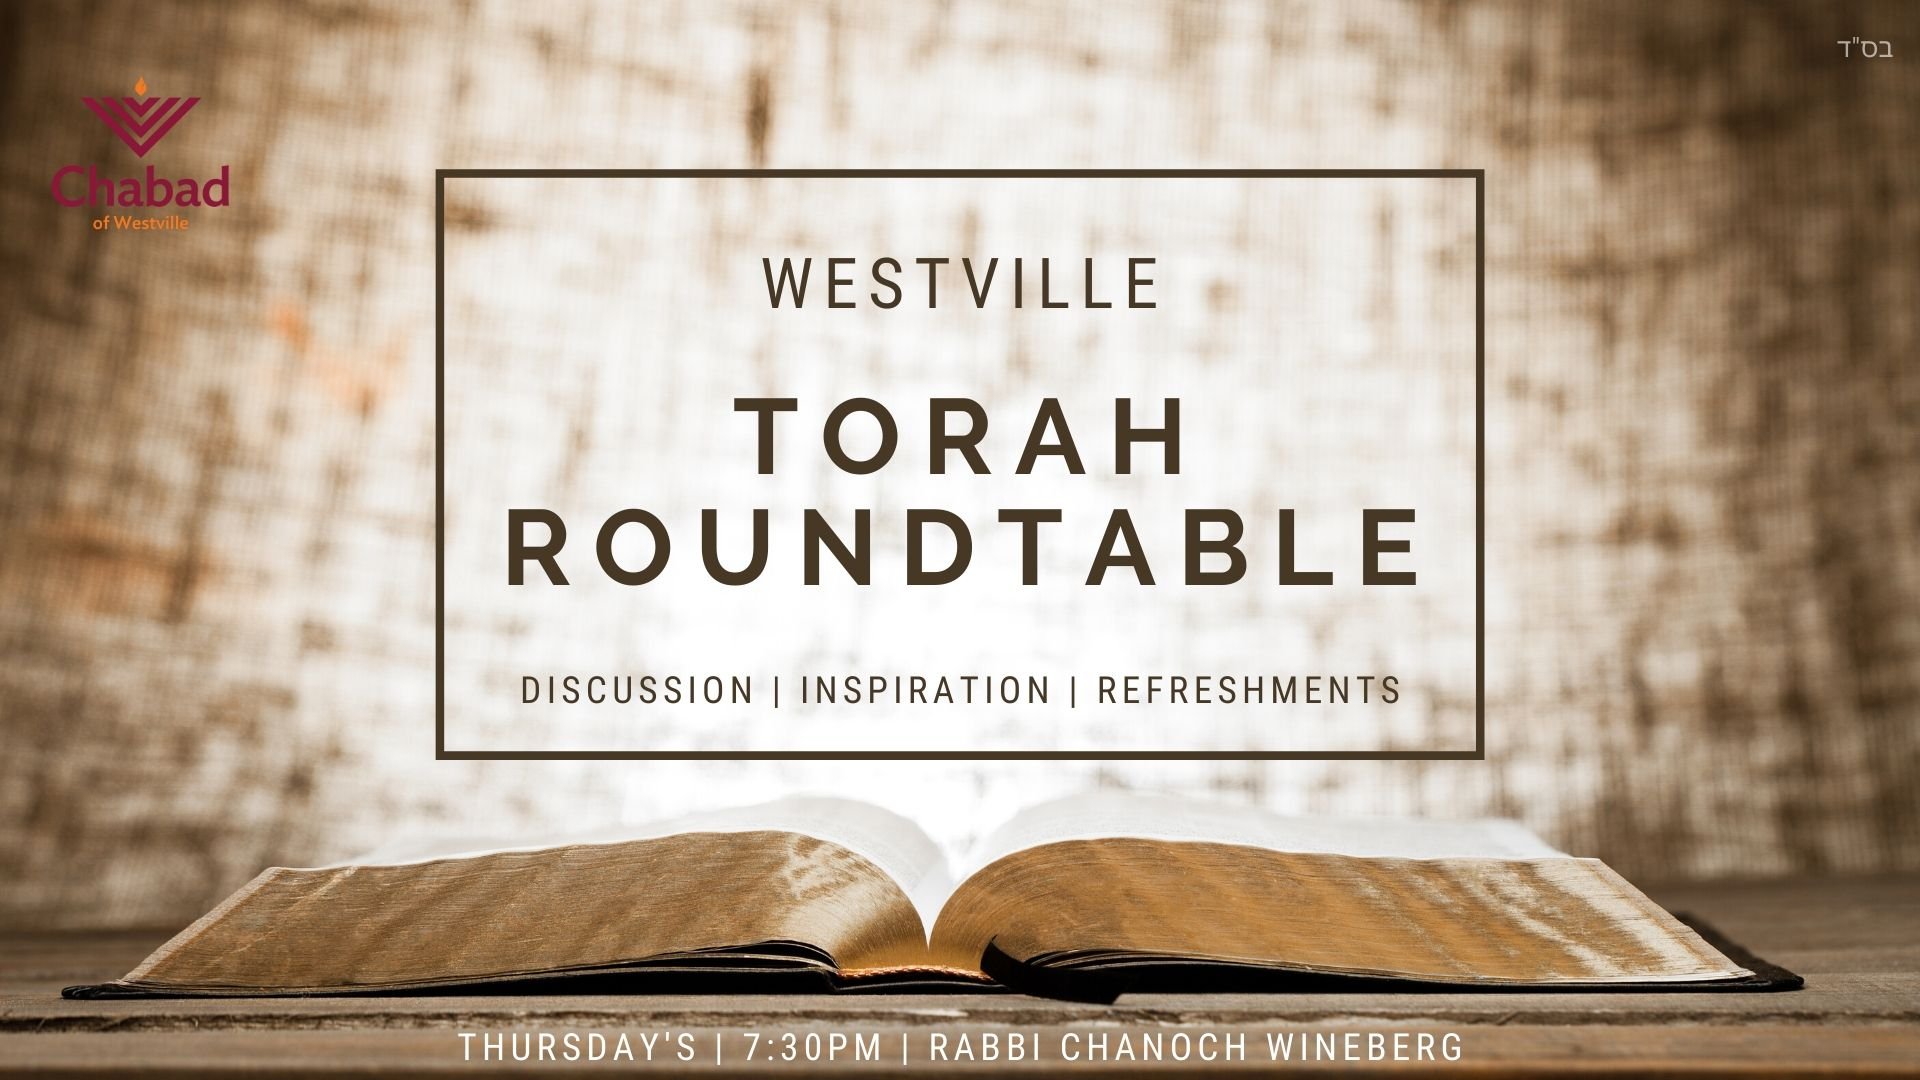 Westville's Weekly Torah Study